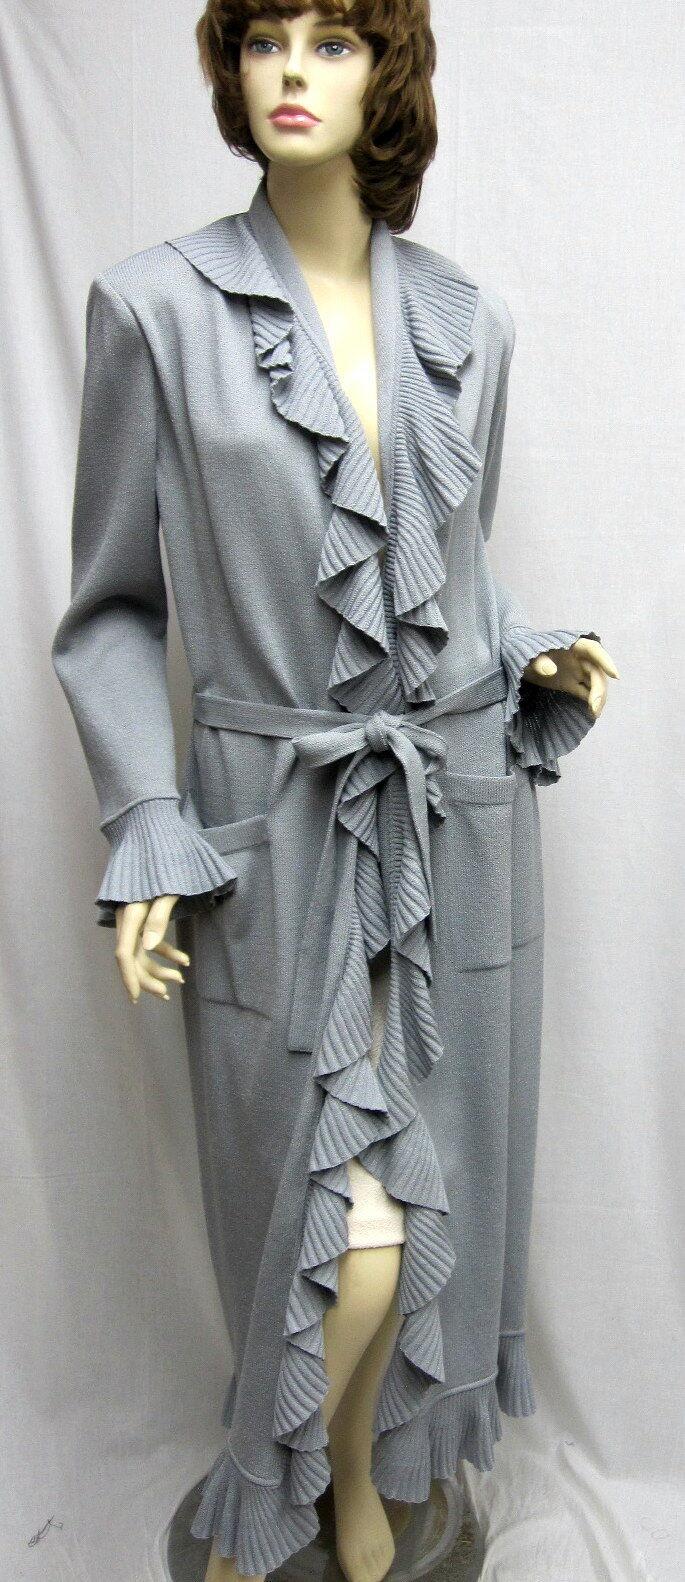 St John Knit Steel Grey Kelly COAT Ruffle SZ 10 12 NWT 1500